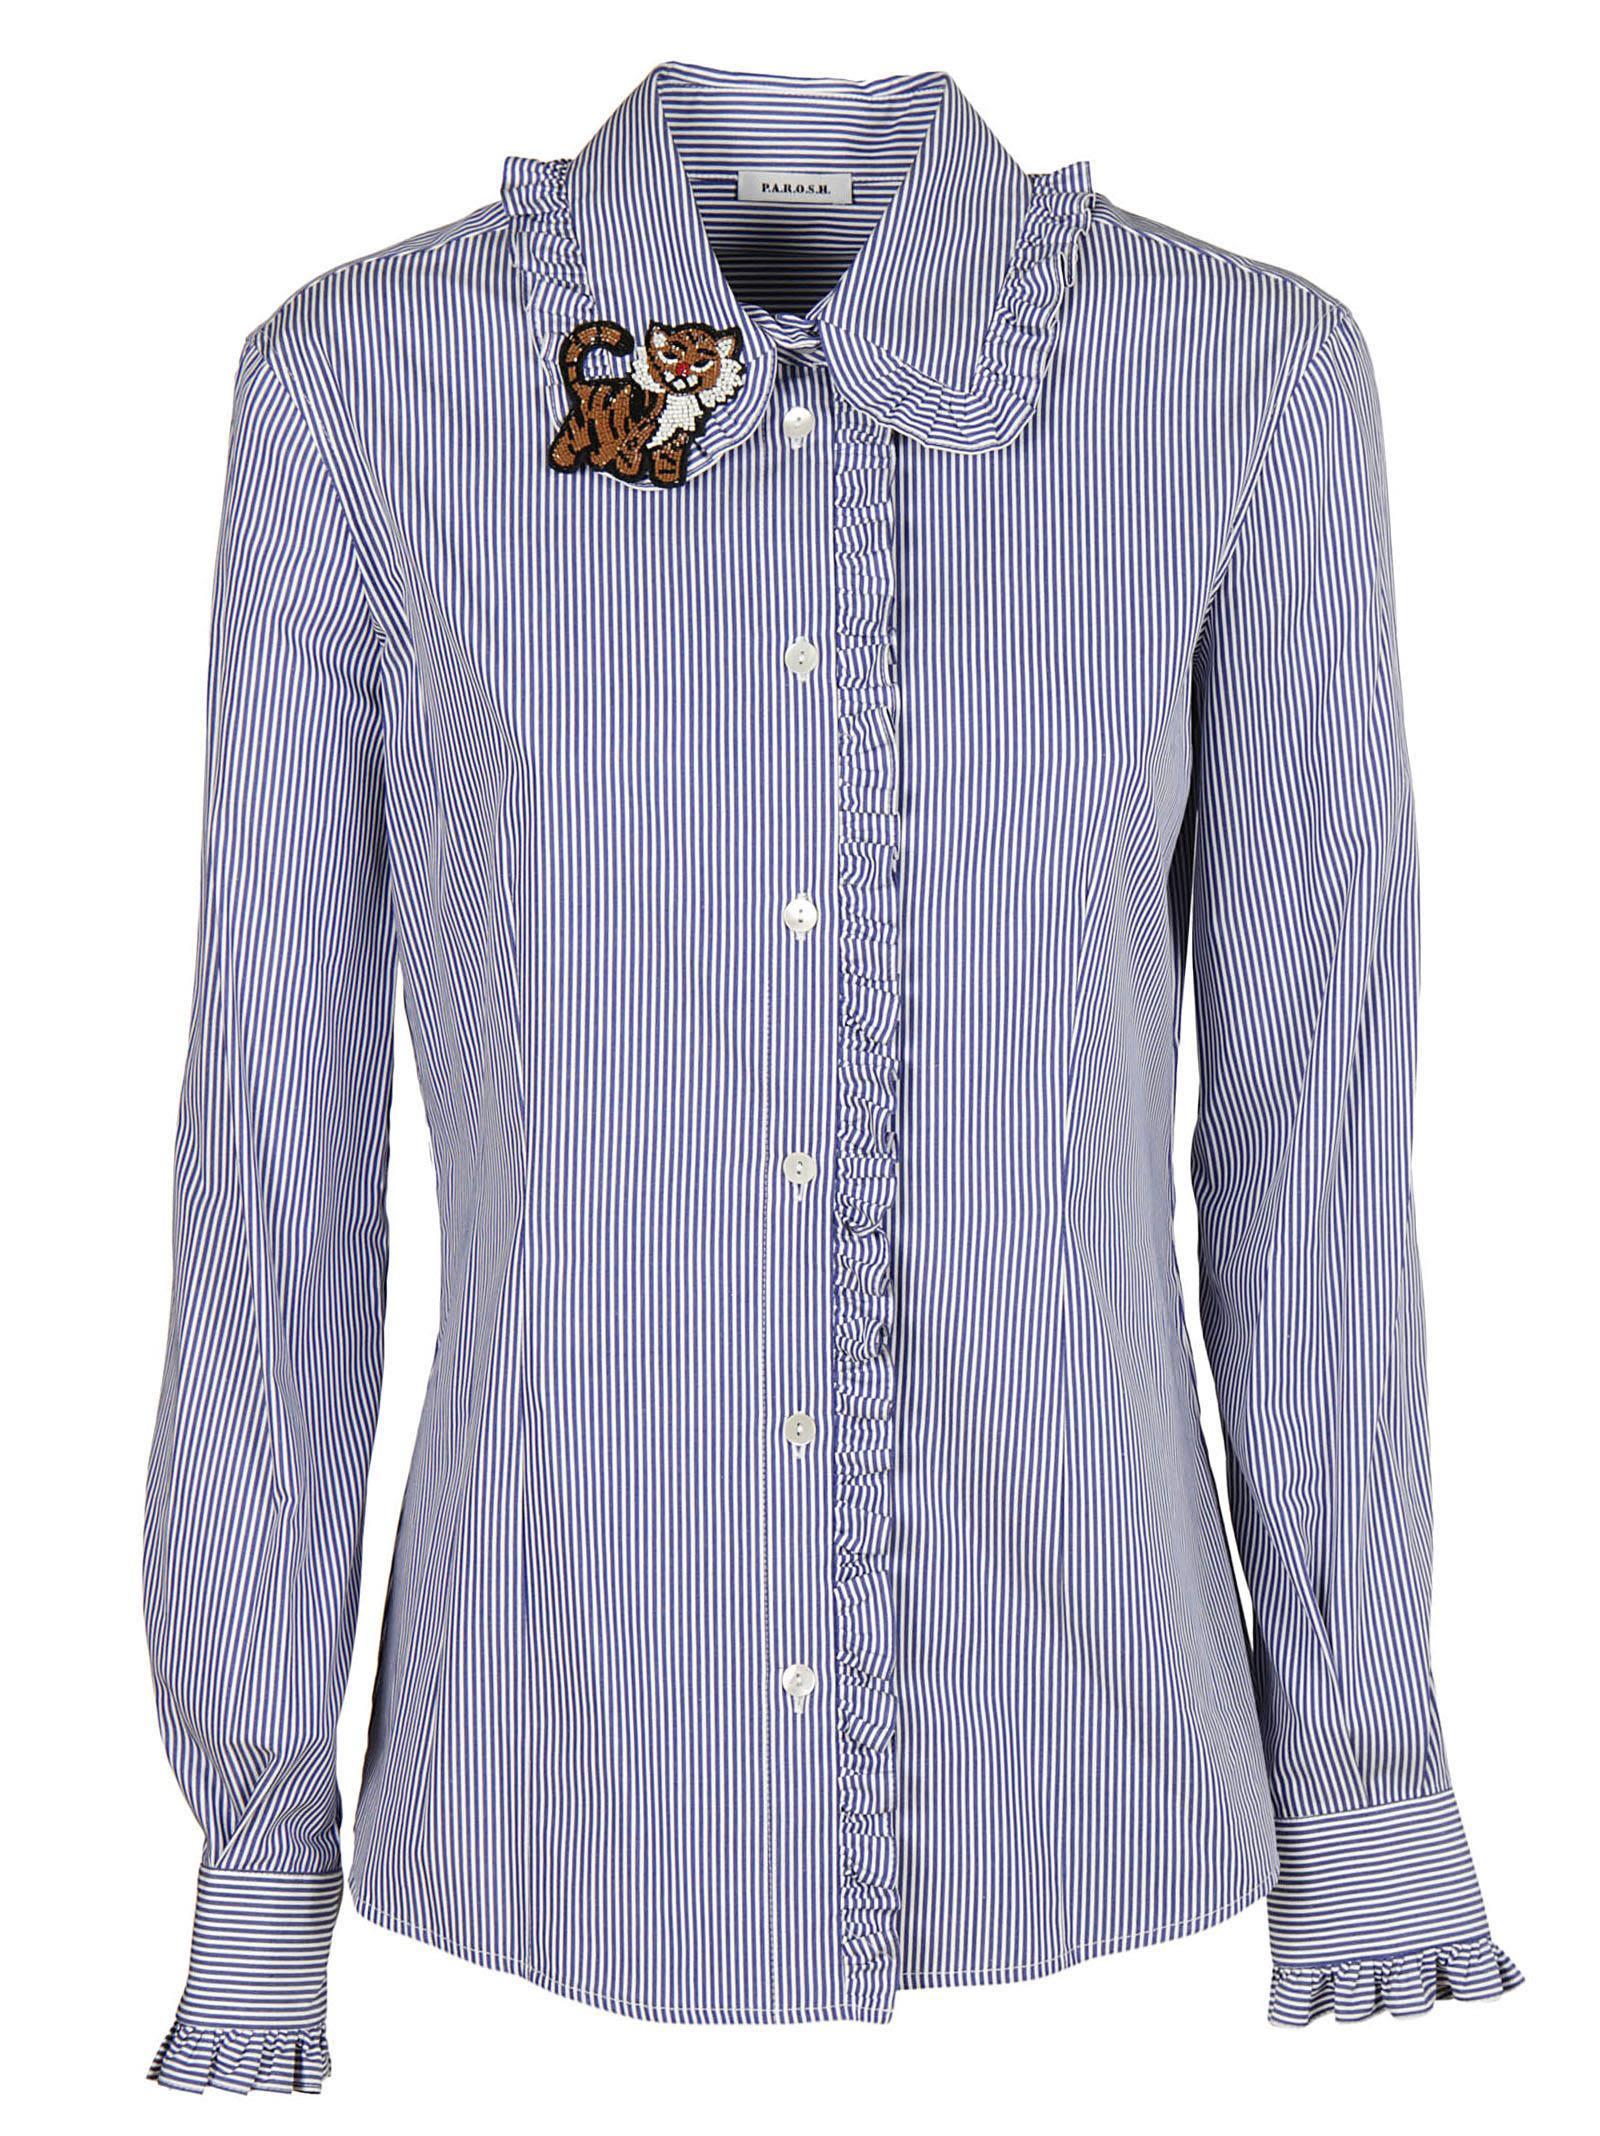 Parosh Striped Shirt